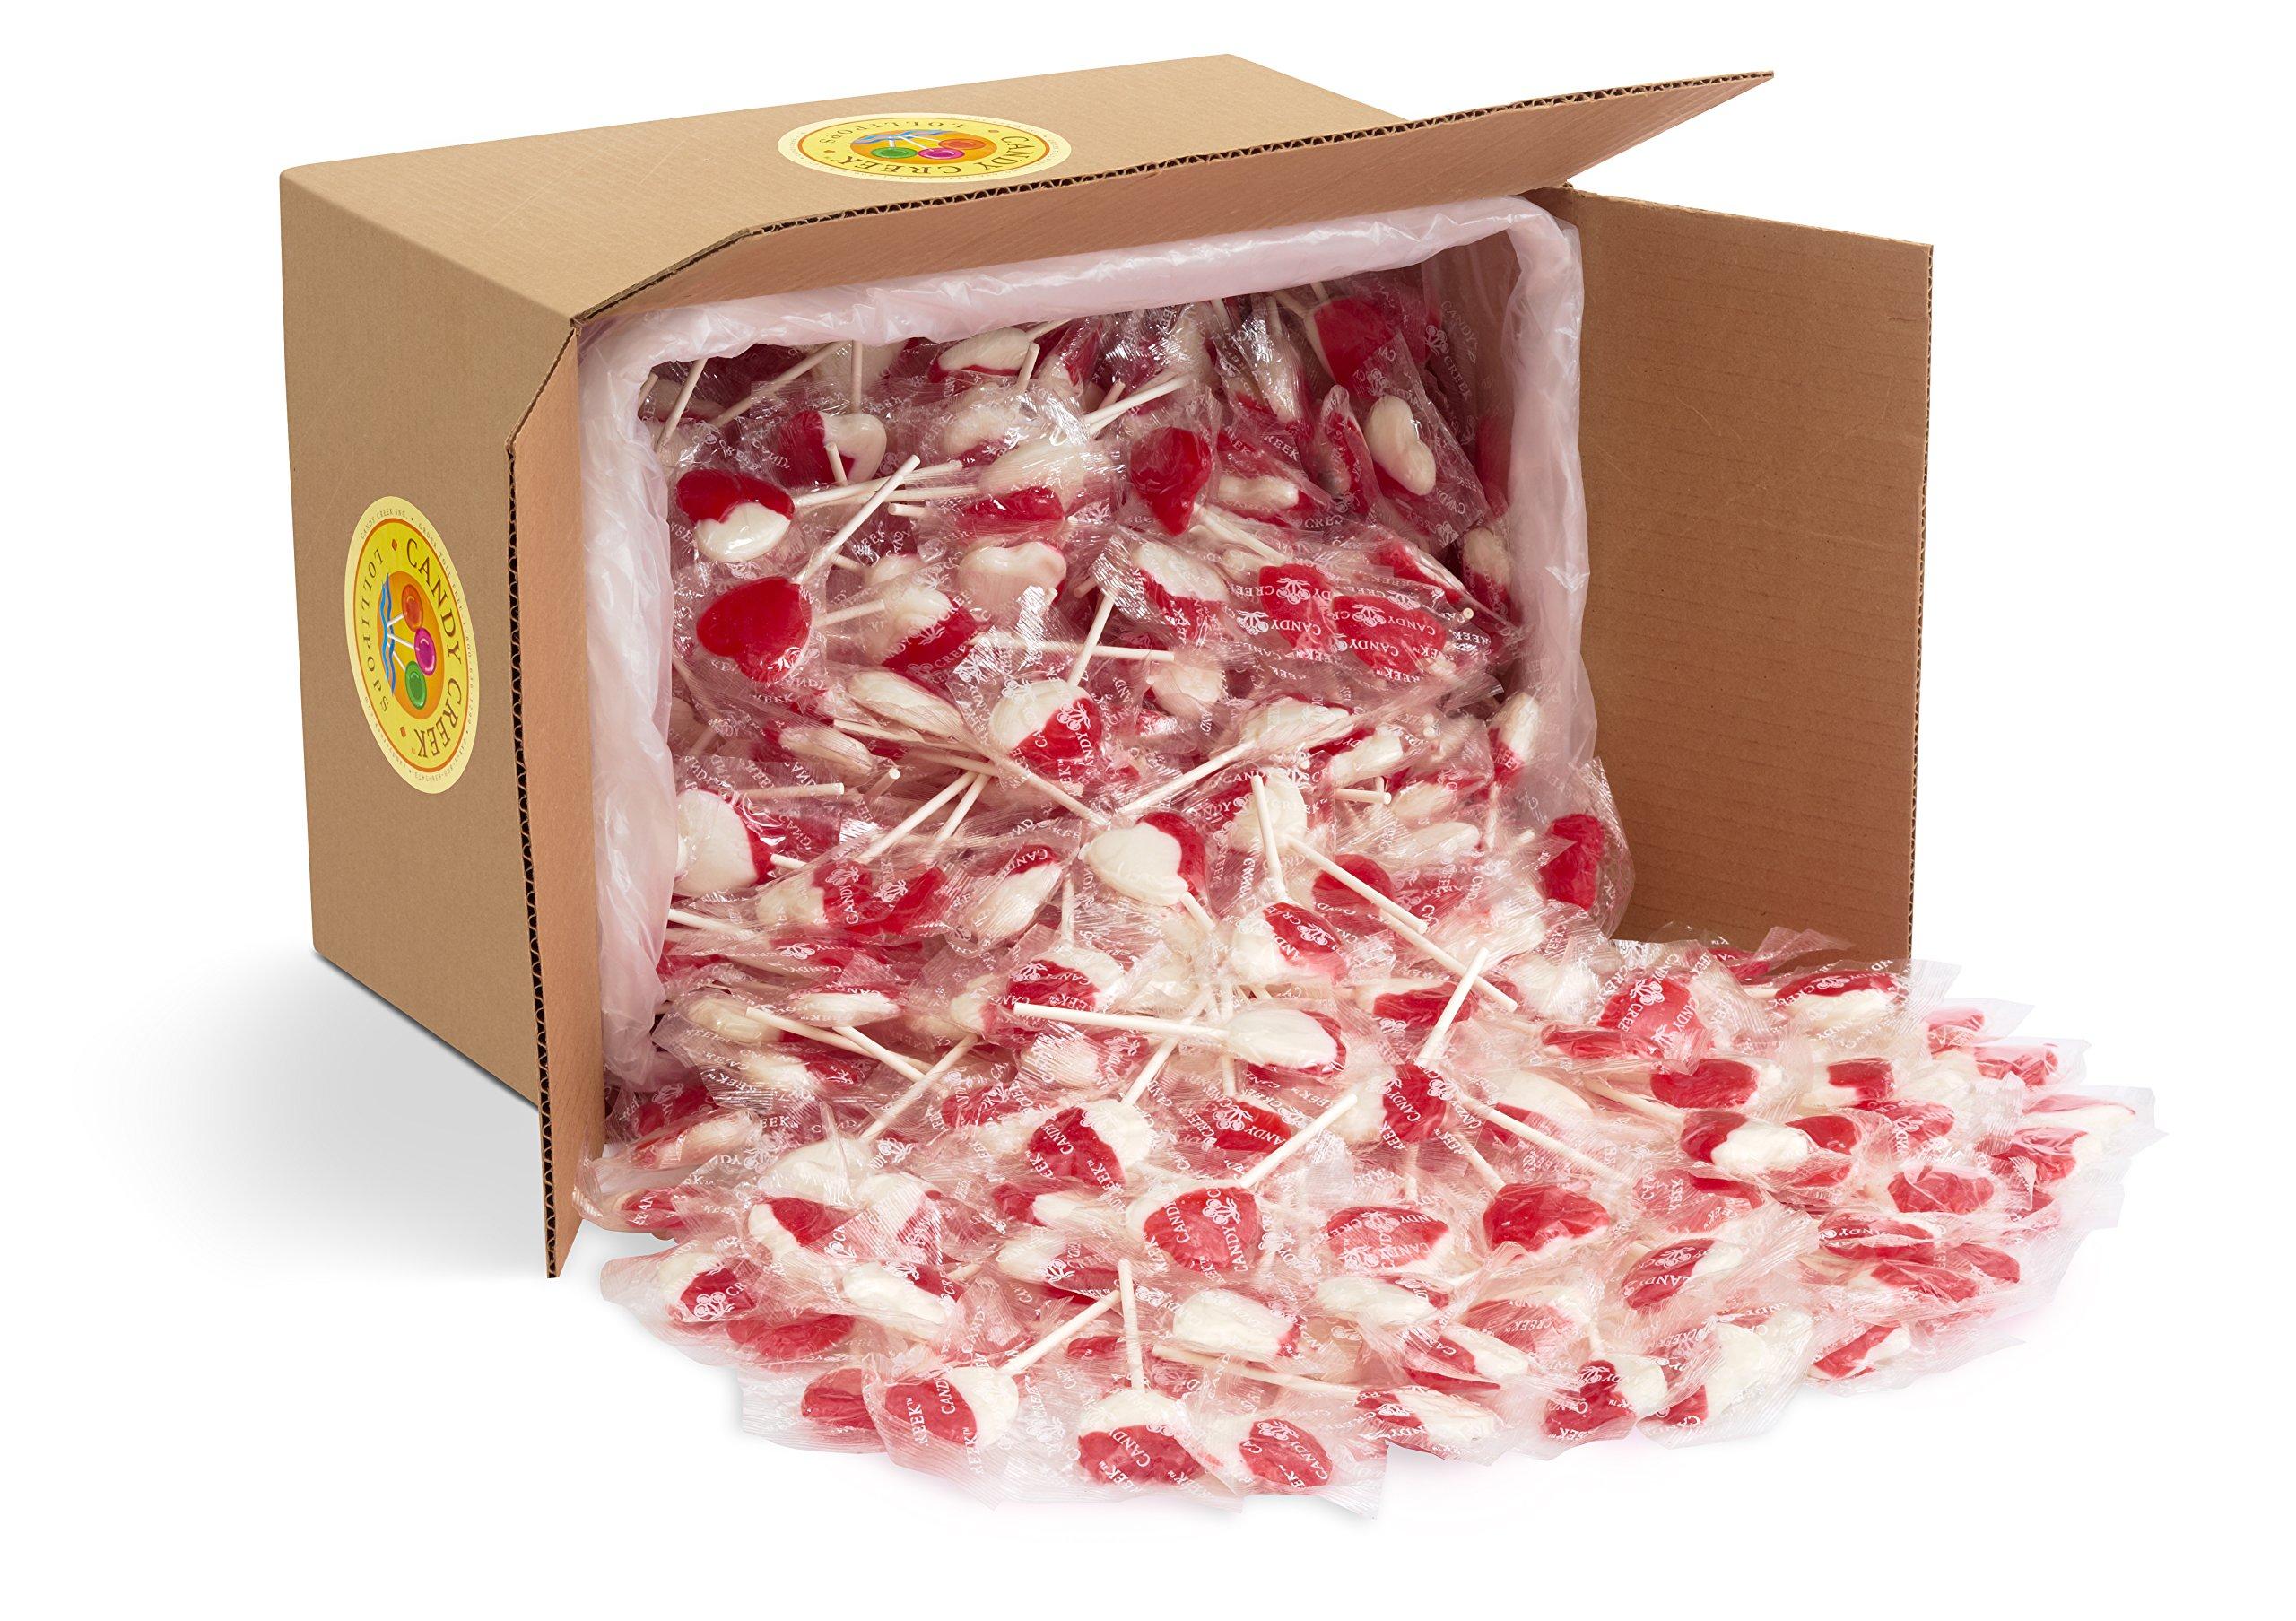 Heart Lollipops by Candy Creek, Bulk 18 lb. Carton, Strawberry Cream Valentine's Candy by Candy Creek Lollipops